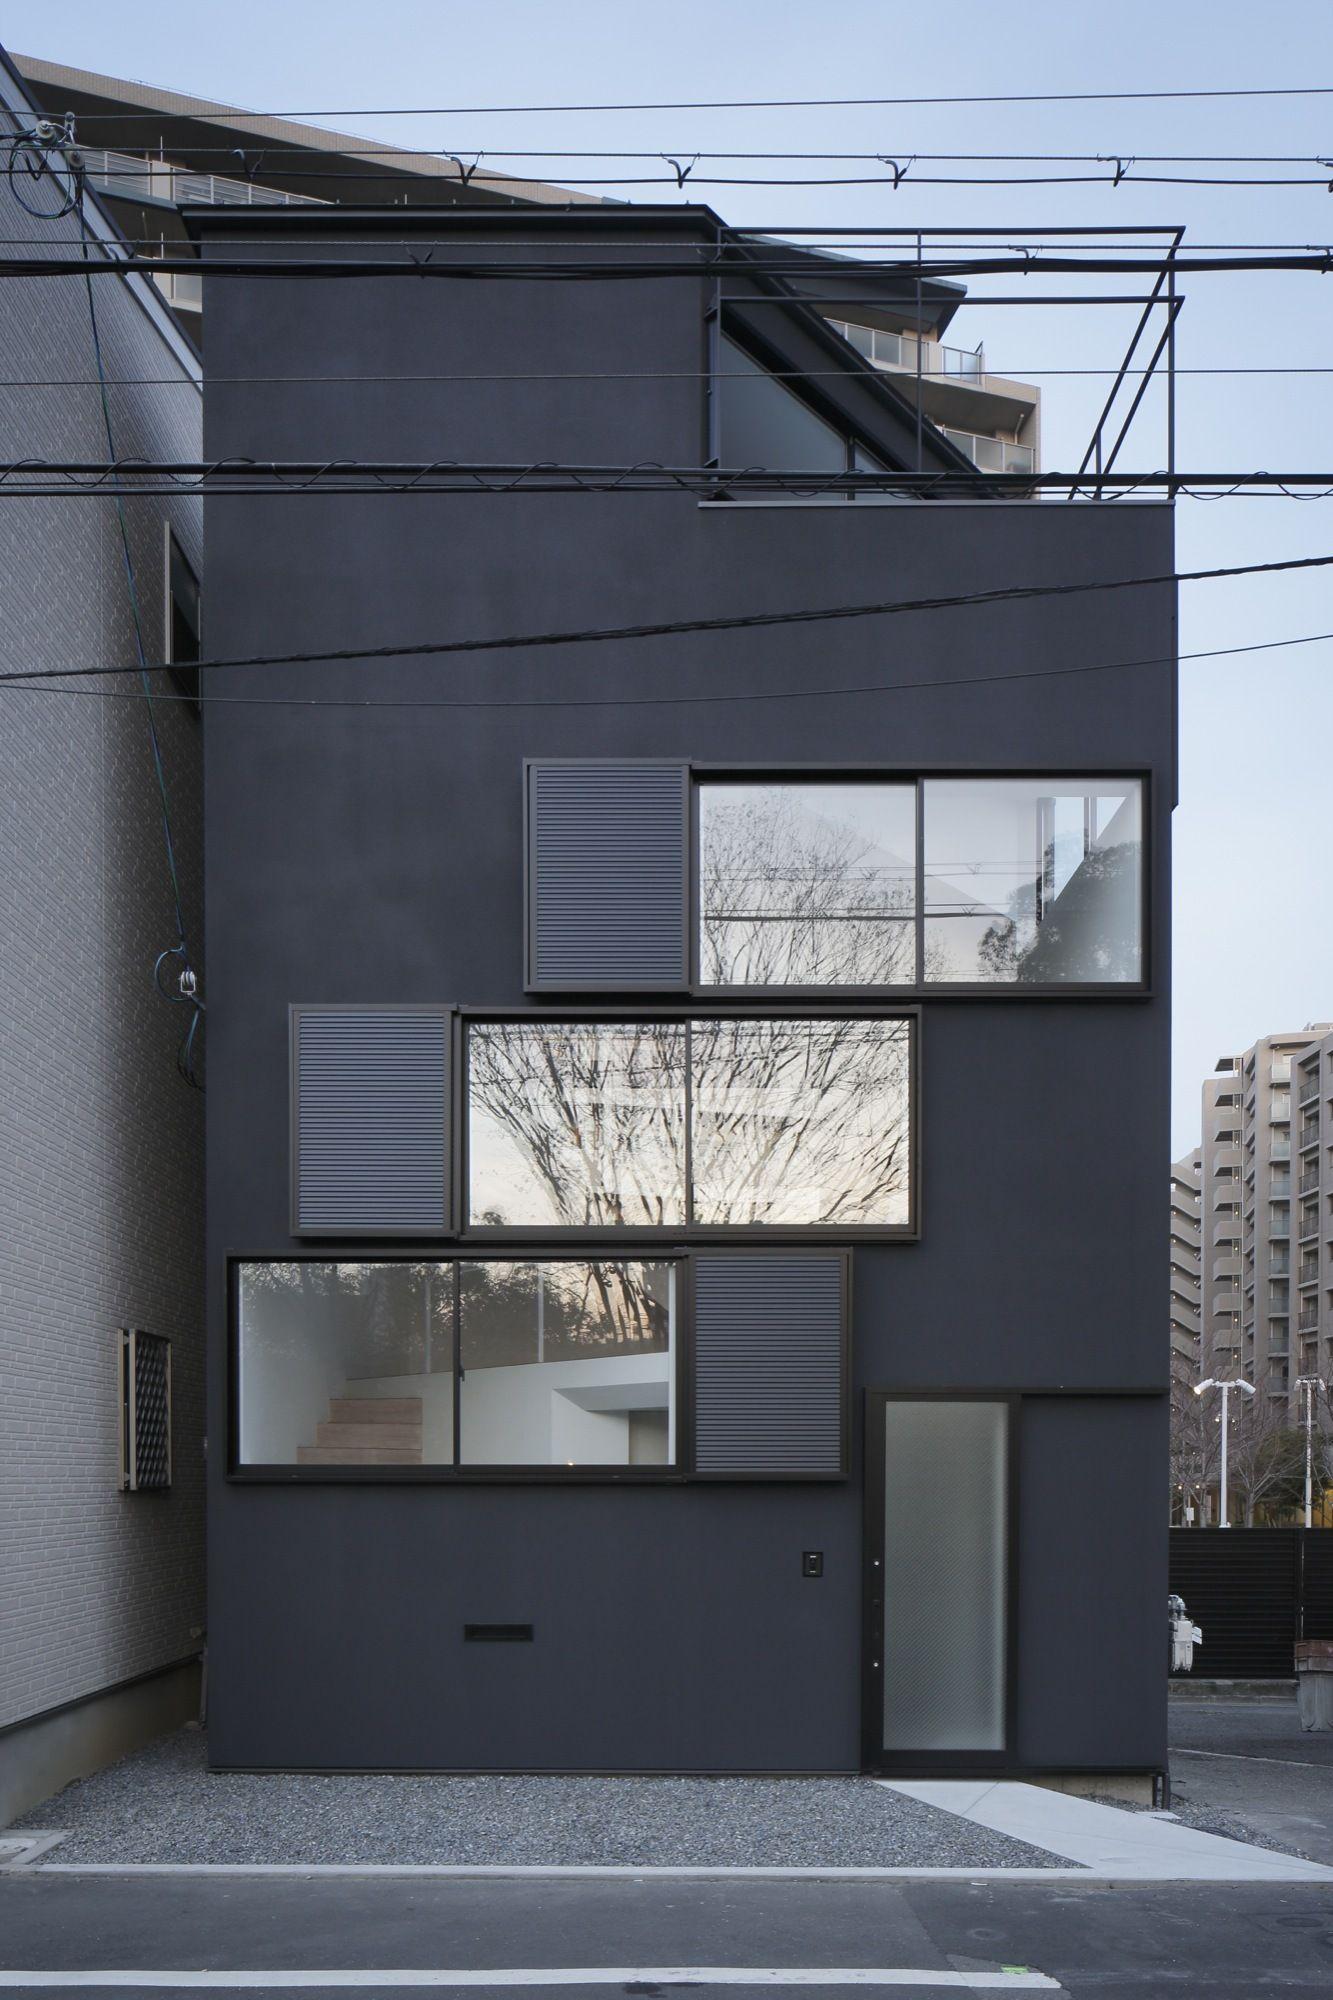 Casa das janelas em espiral / Alphaville Architects   ArchDaily Brasil